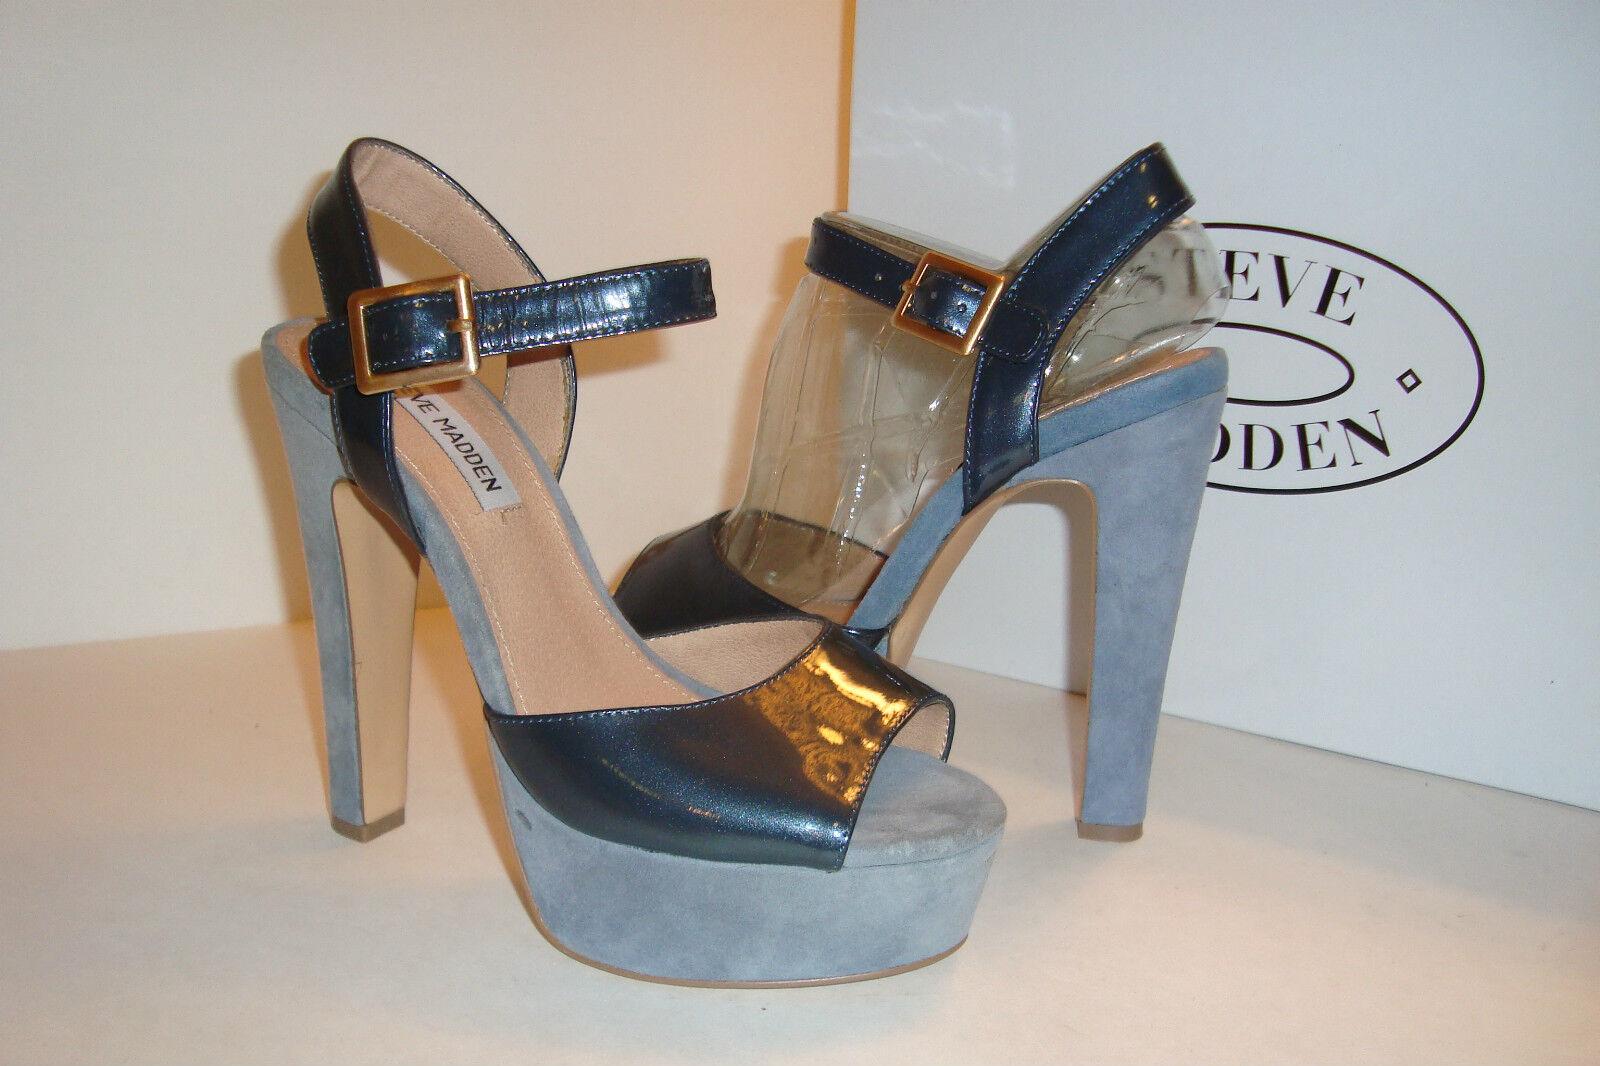 Steve Madden Damenschuhe Dynemite Blau Multi Ankle Sandale Schuhes 9 MED DISPLAY